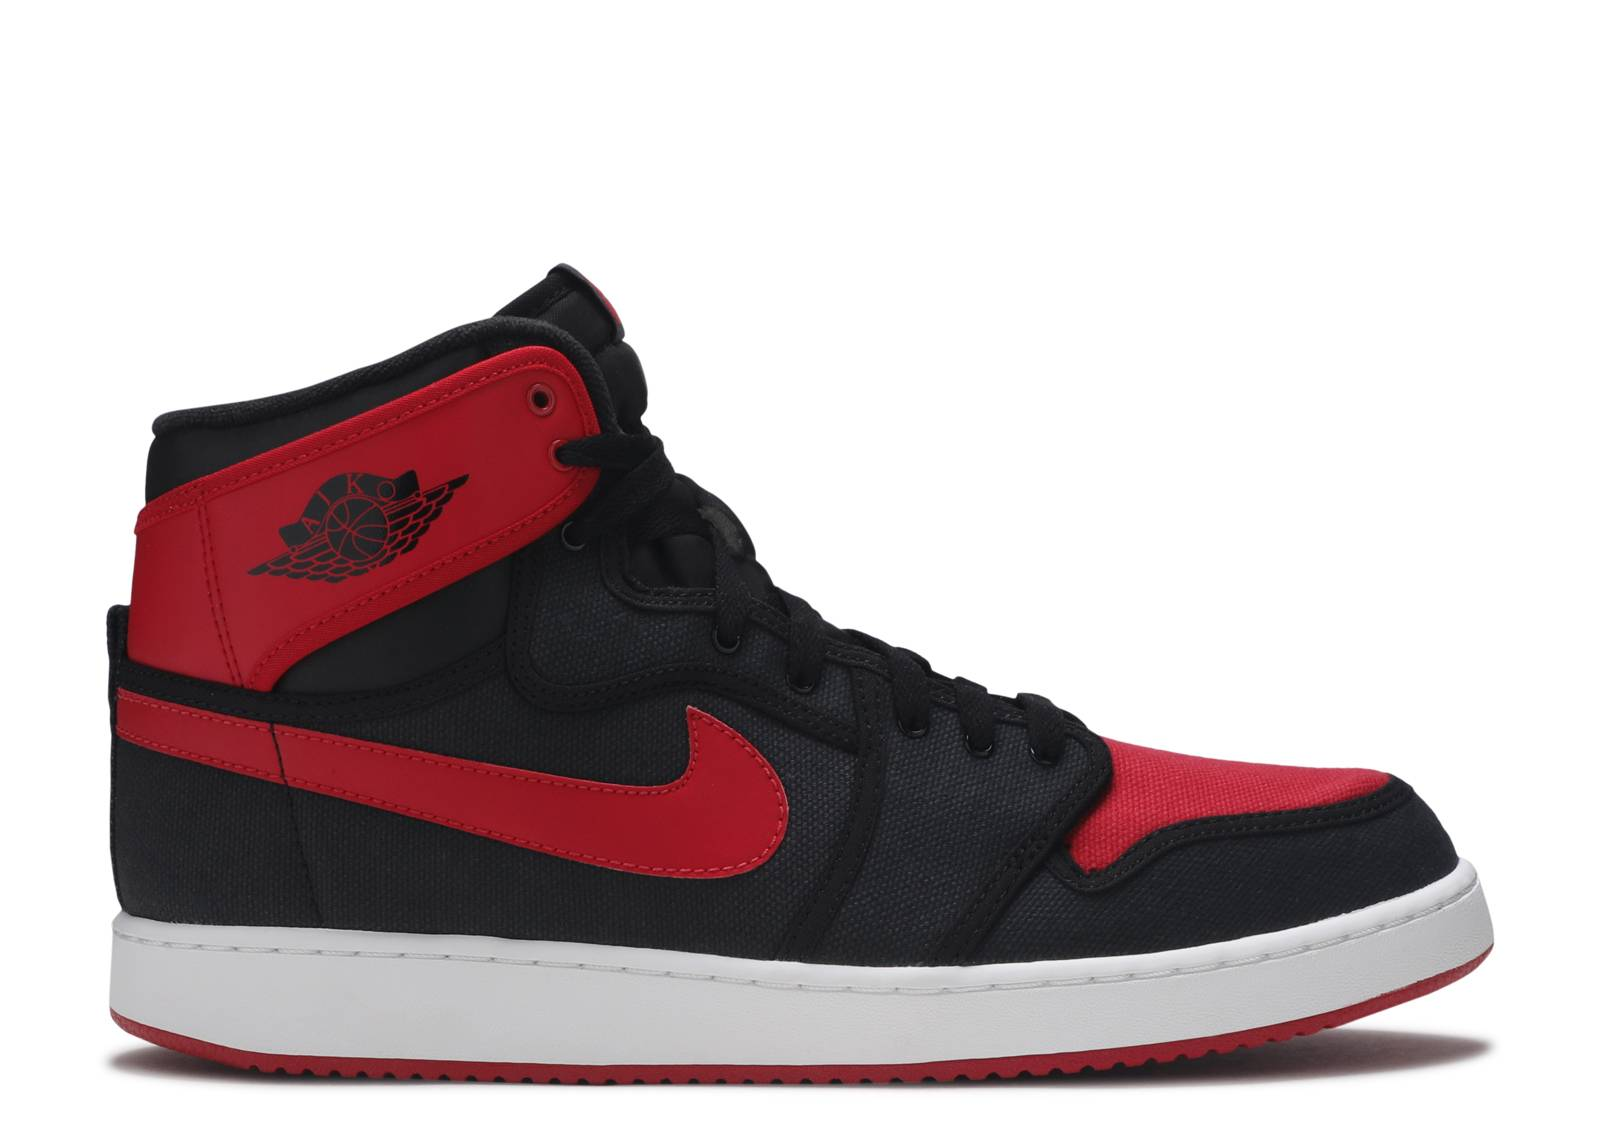 Nike Air Jordans 1 Retro